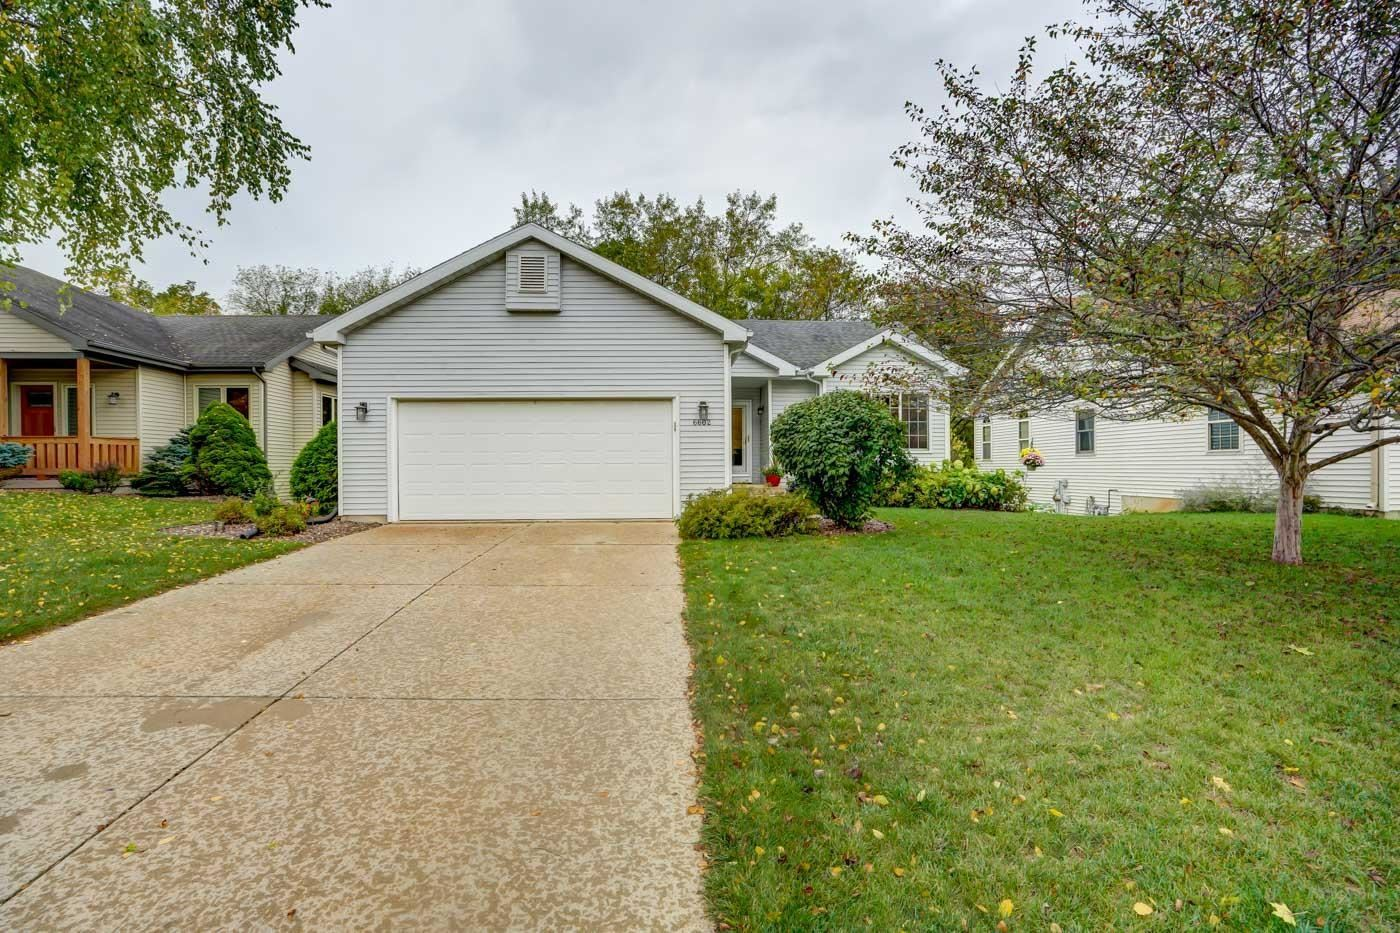 6602 Fieldwood Rd, Madison, WI 53718 - #: 1921940